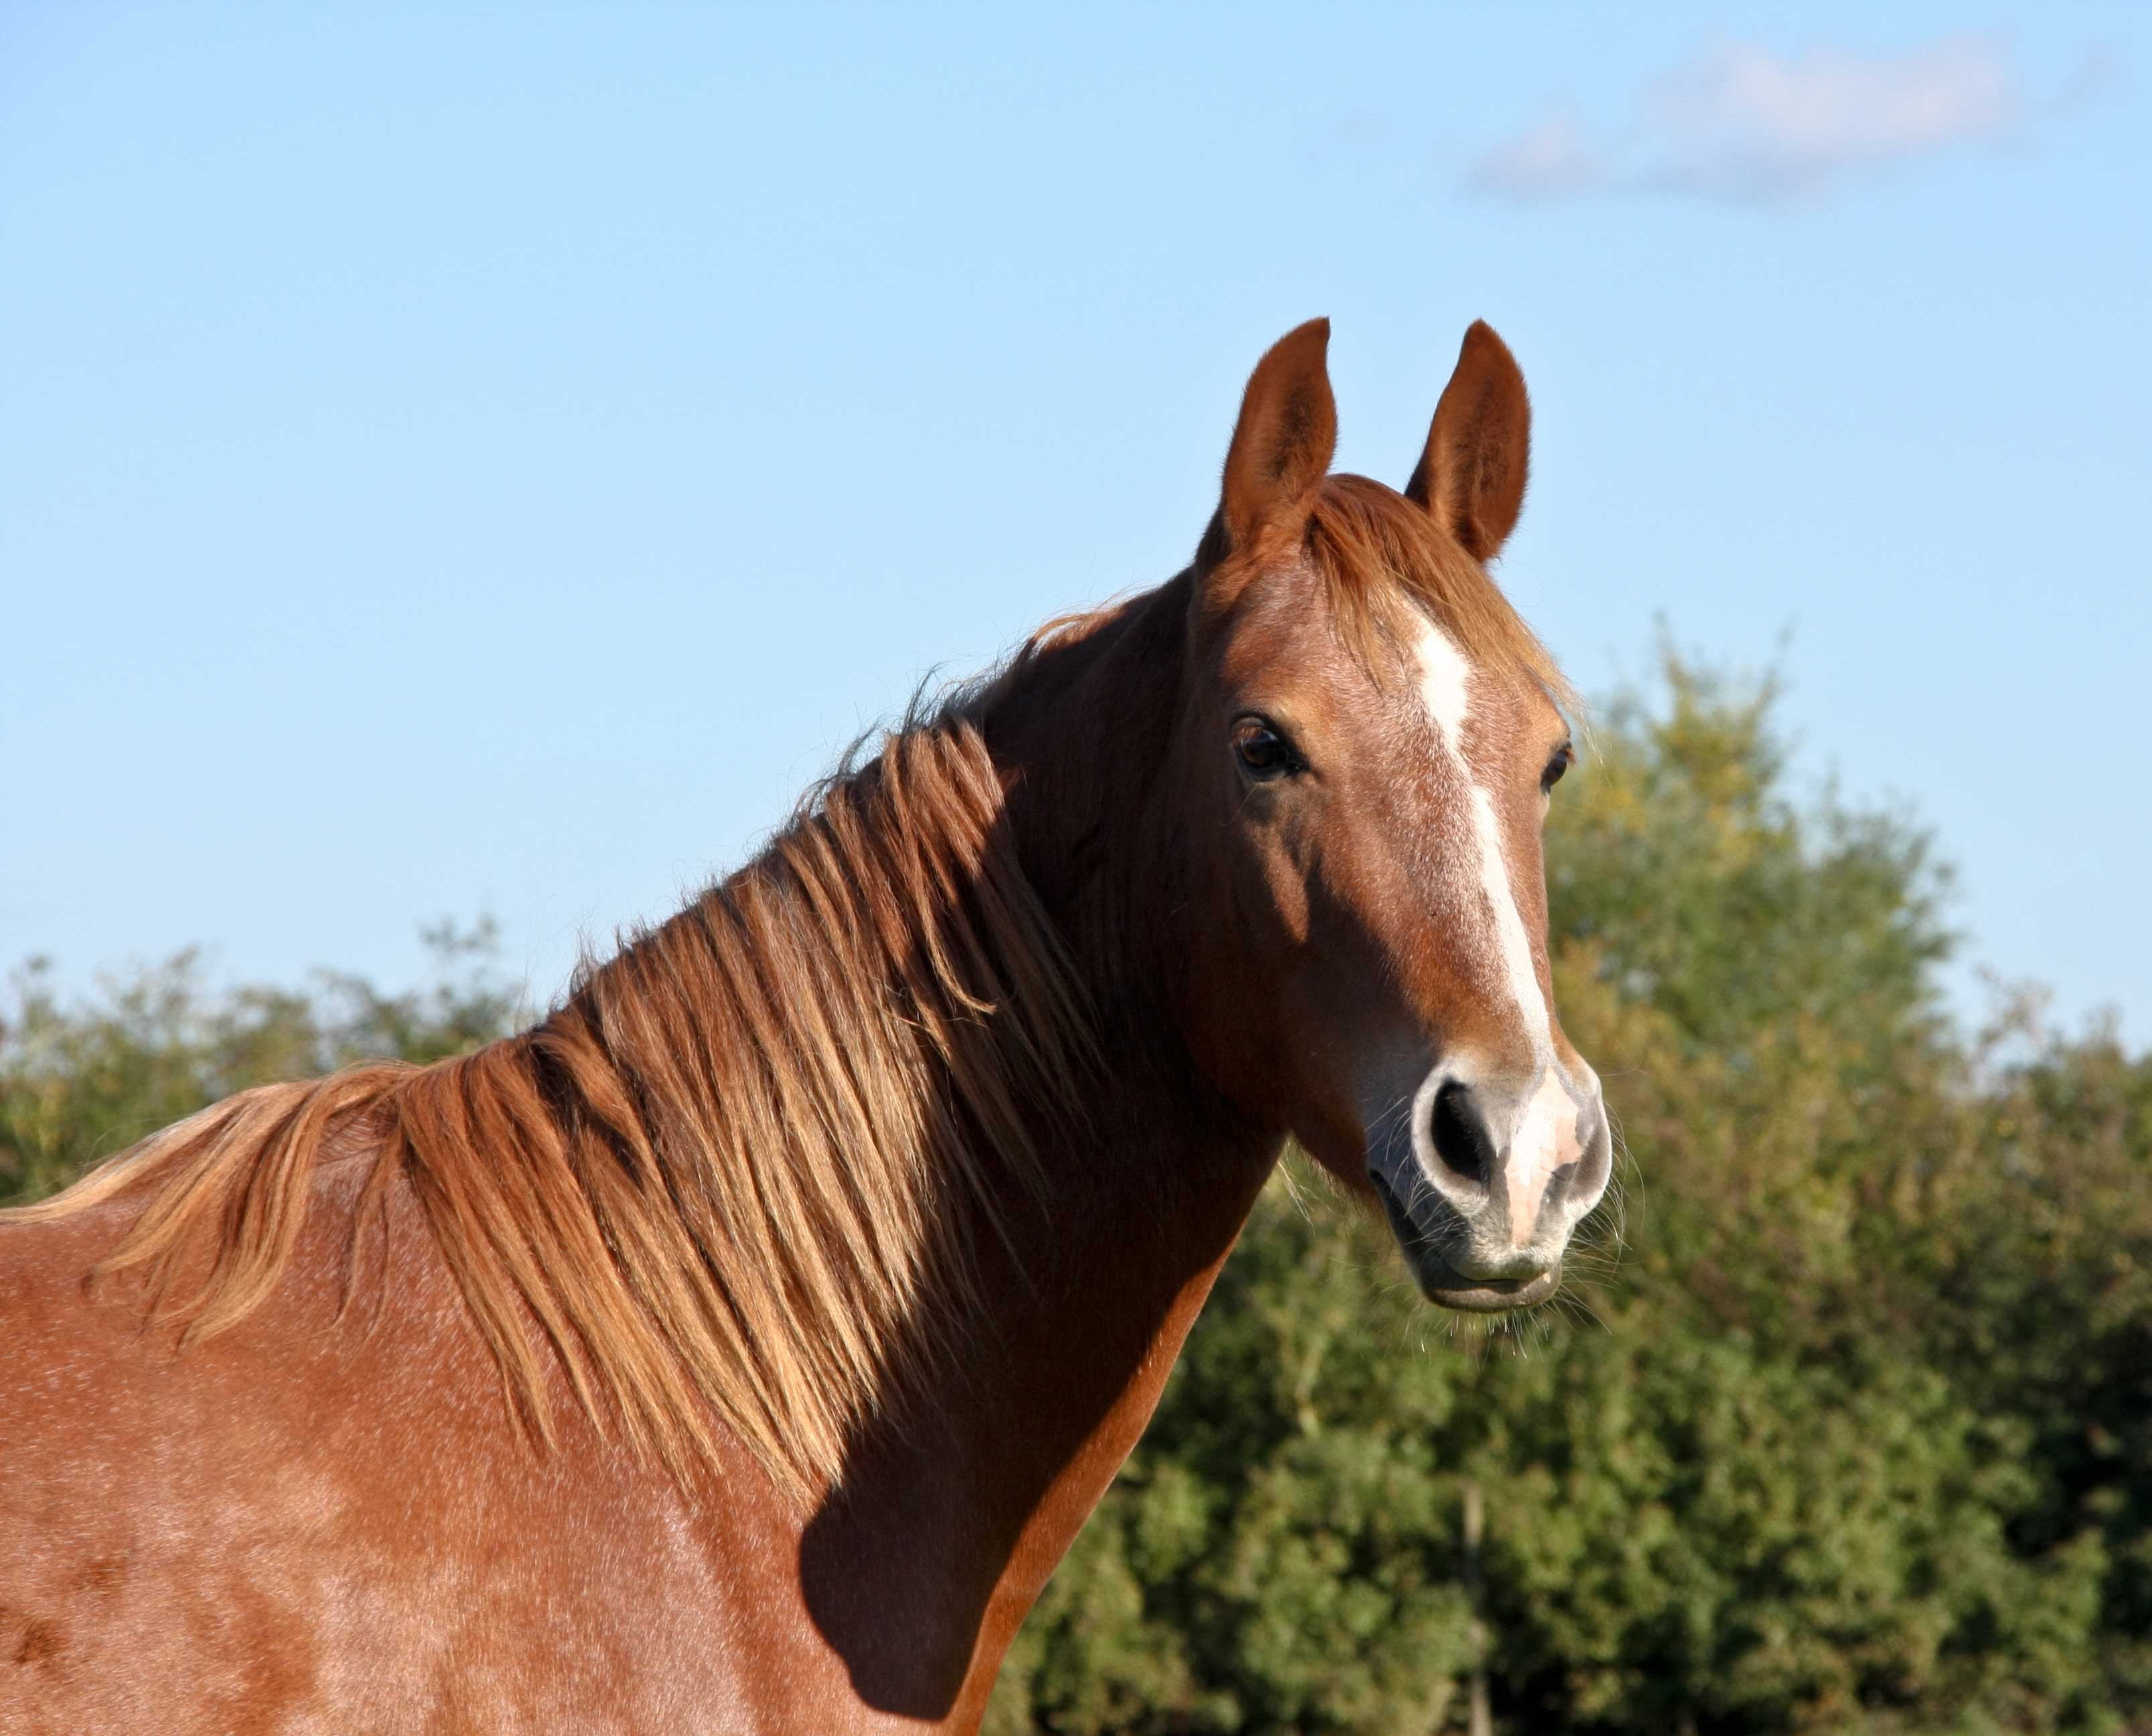 horses-379806_1920